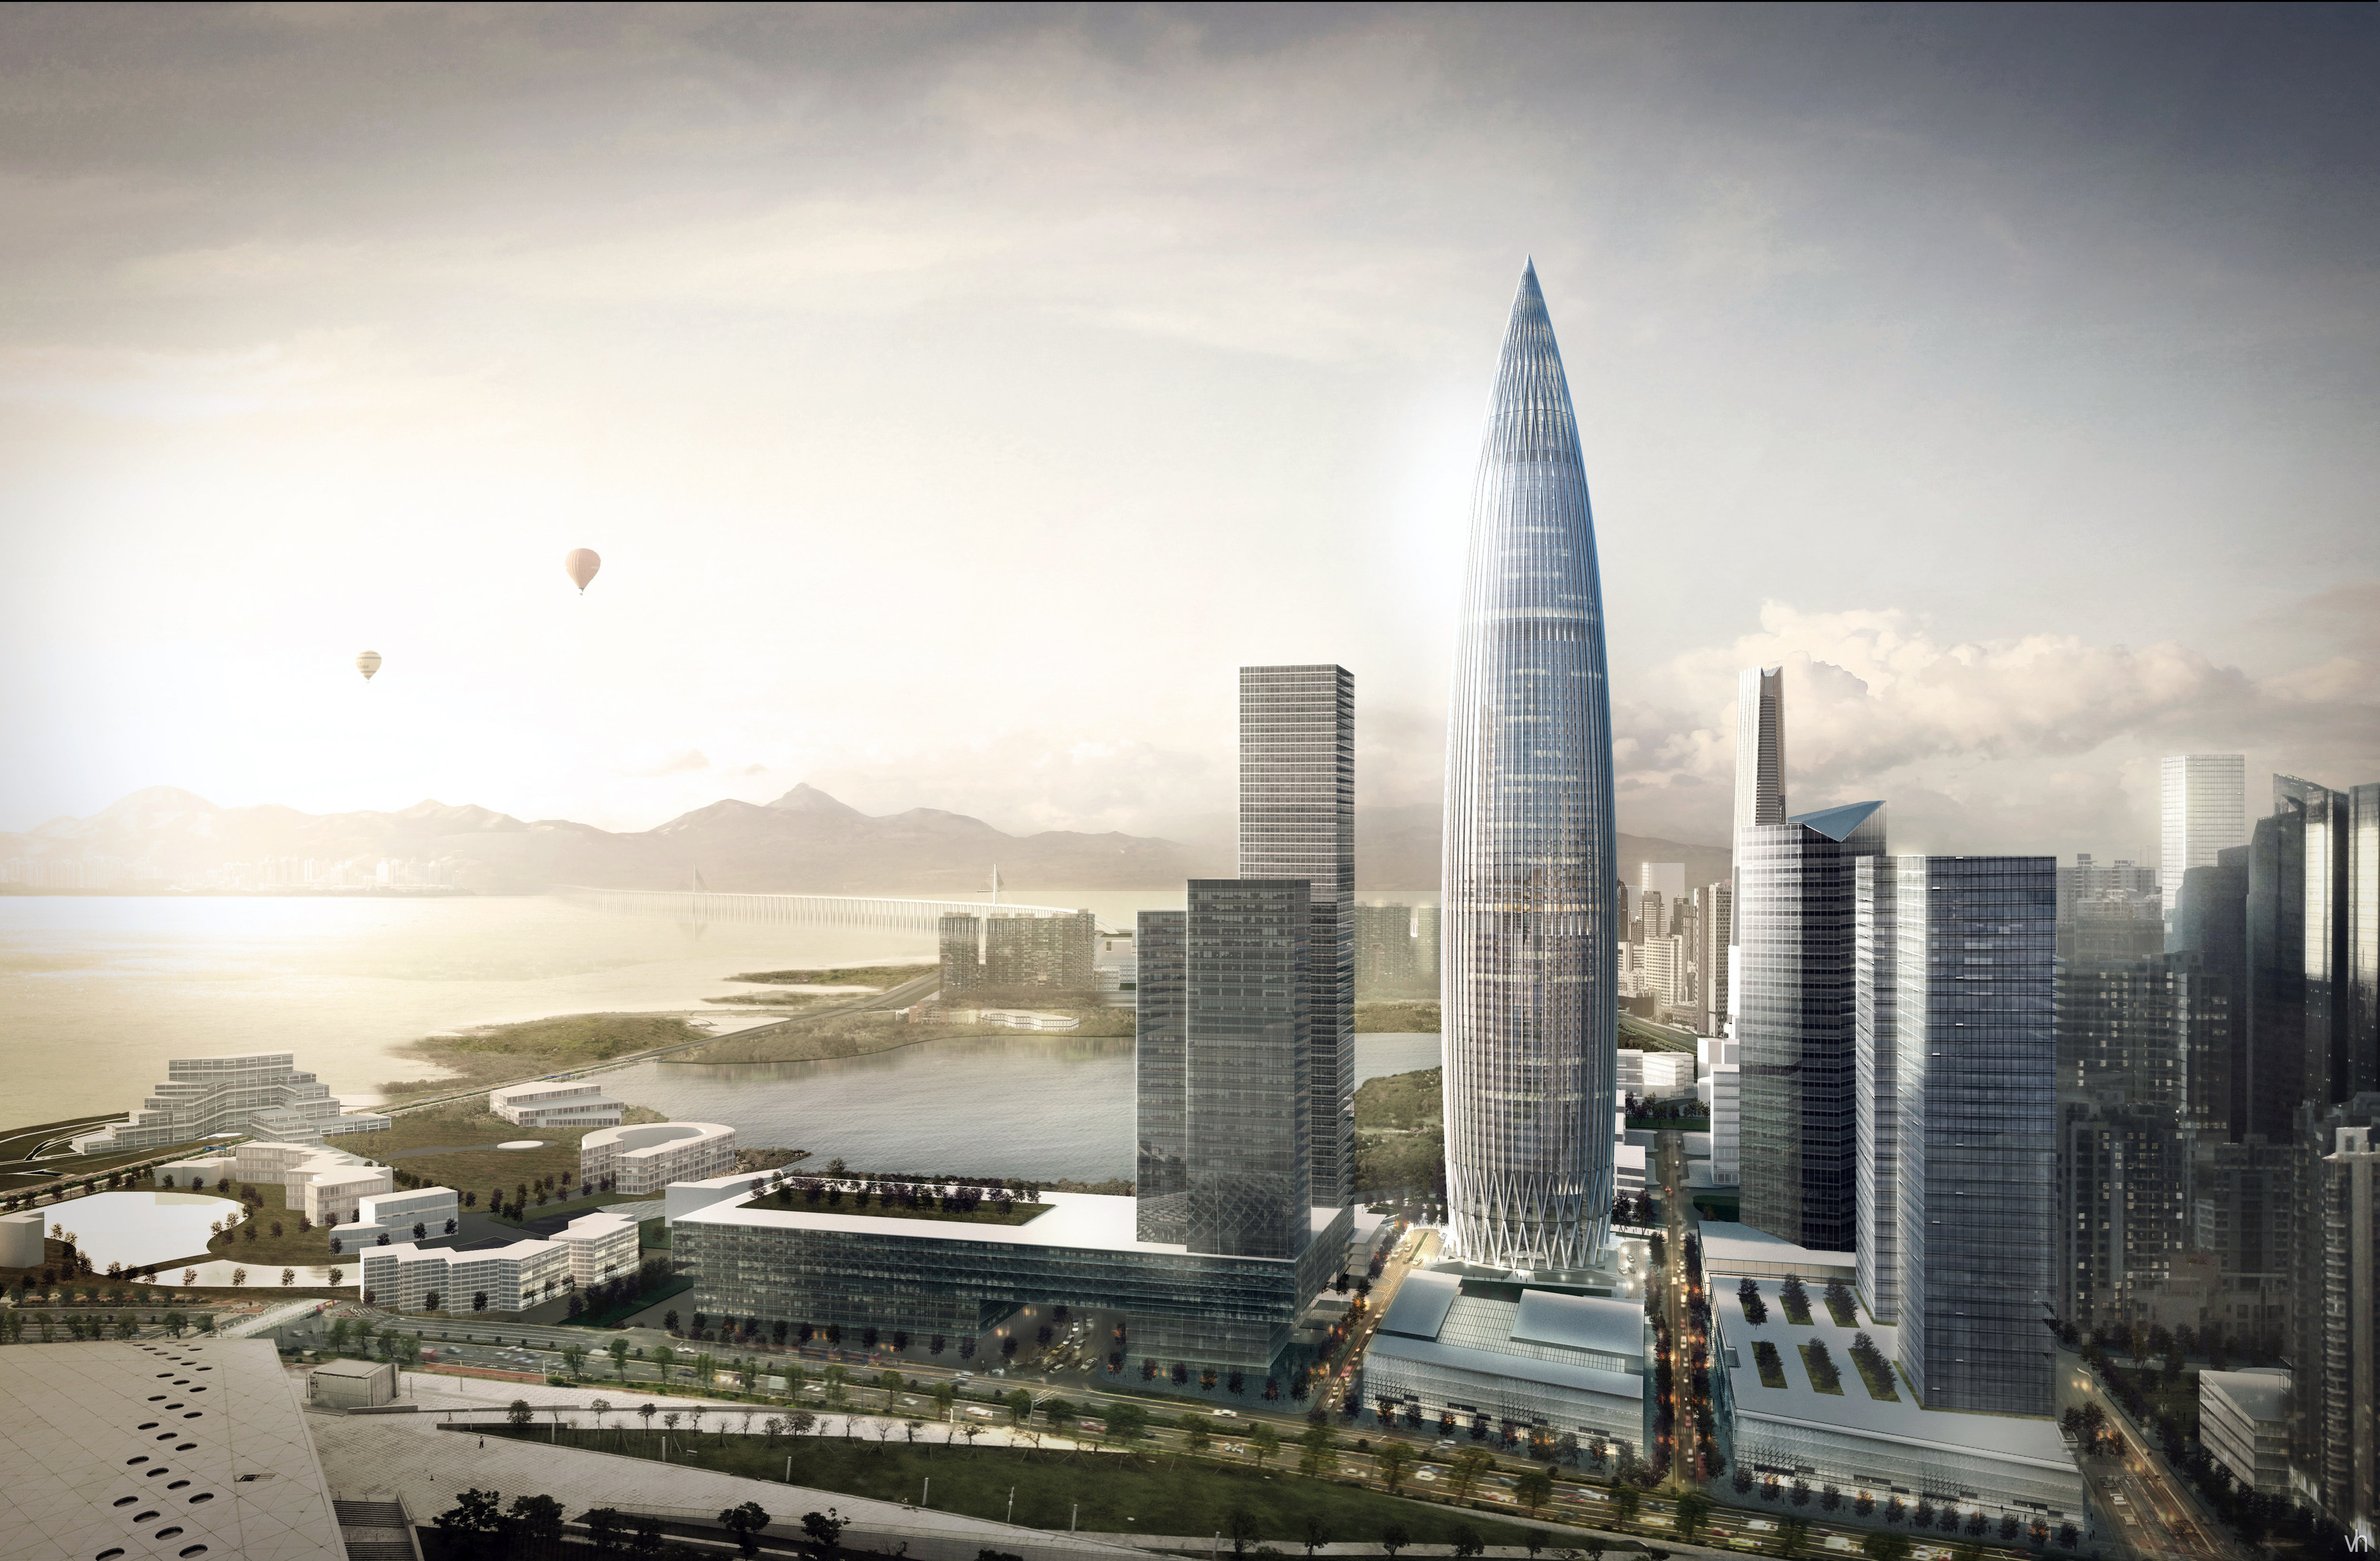 171213130421-china-resources-headquarters-1.jpg